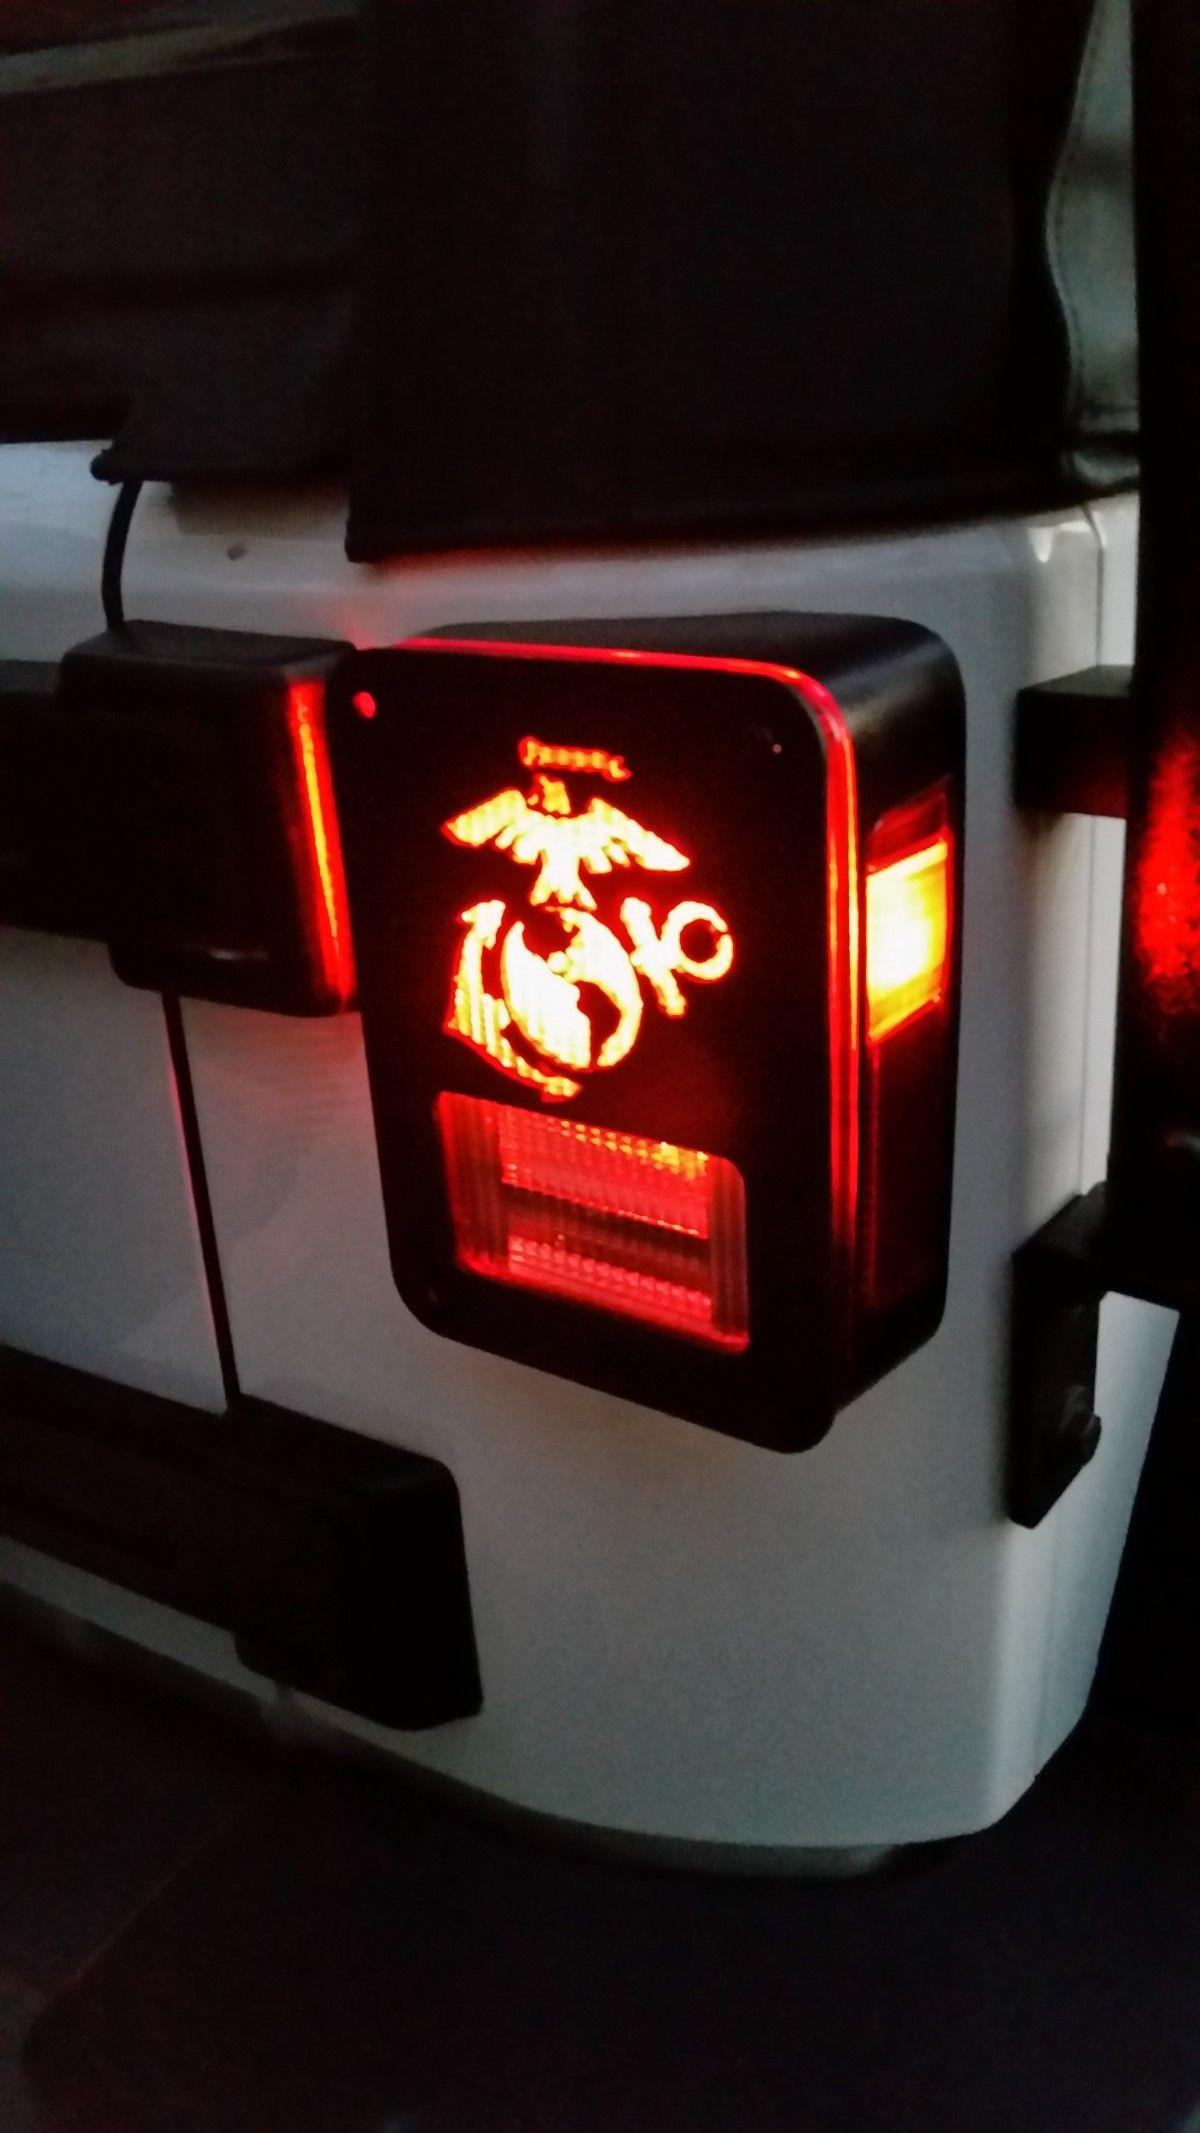 Jeep Wrangler Tail Light Guards Jeep Accessories Jeep Wrangler Tail Light Guards Jeep Accessories Jeep Wrangler